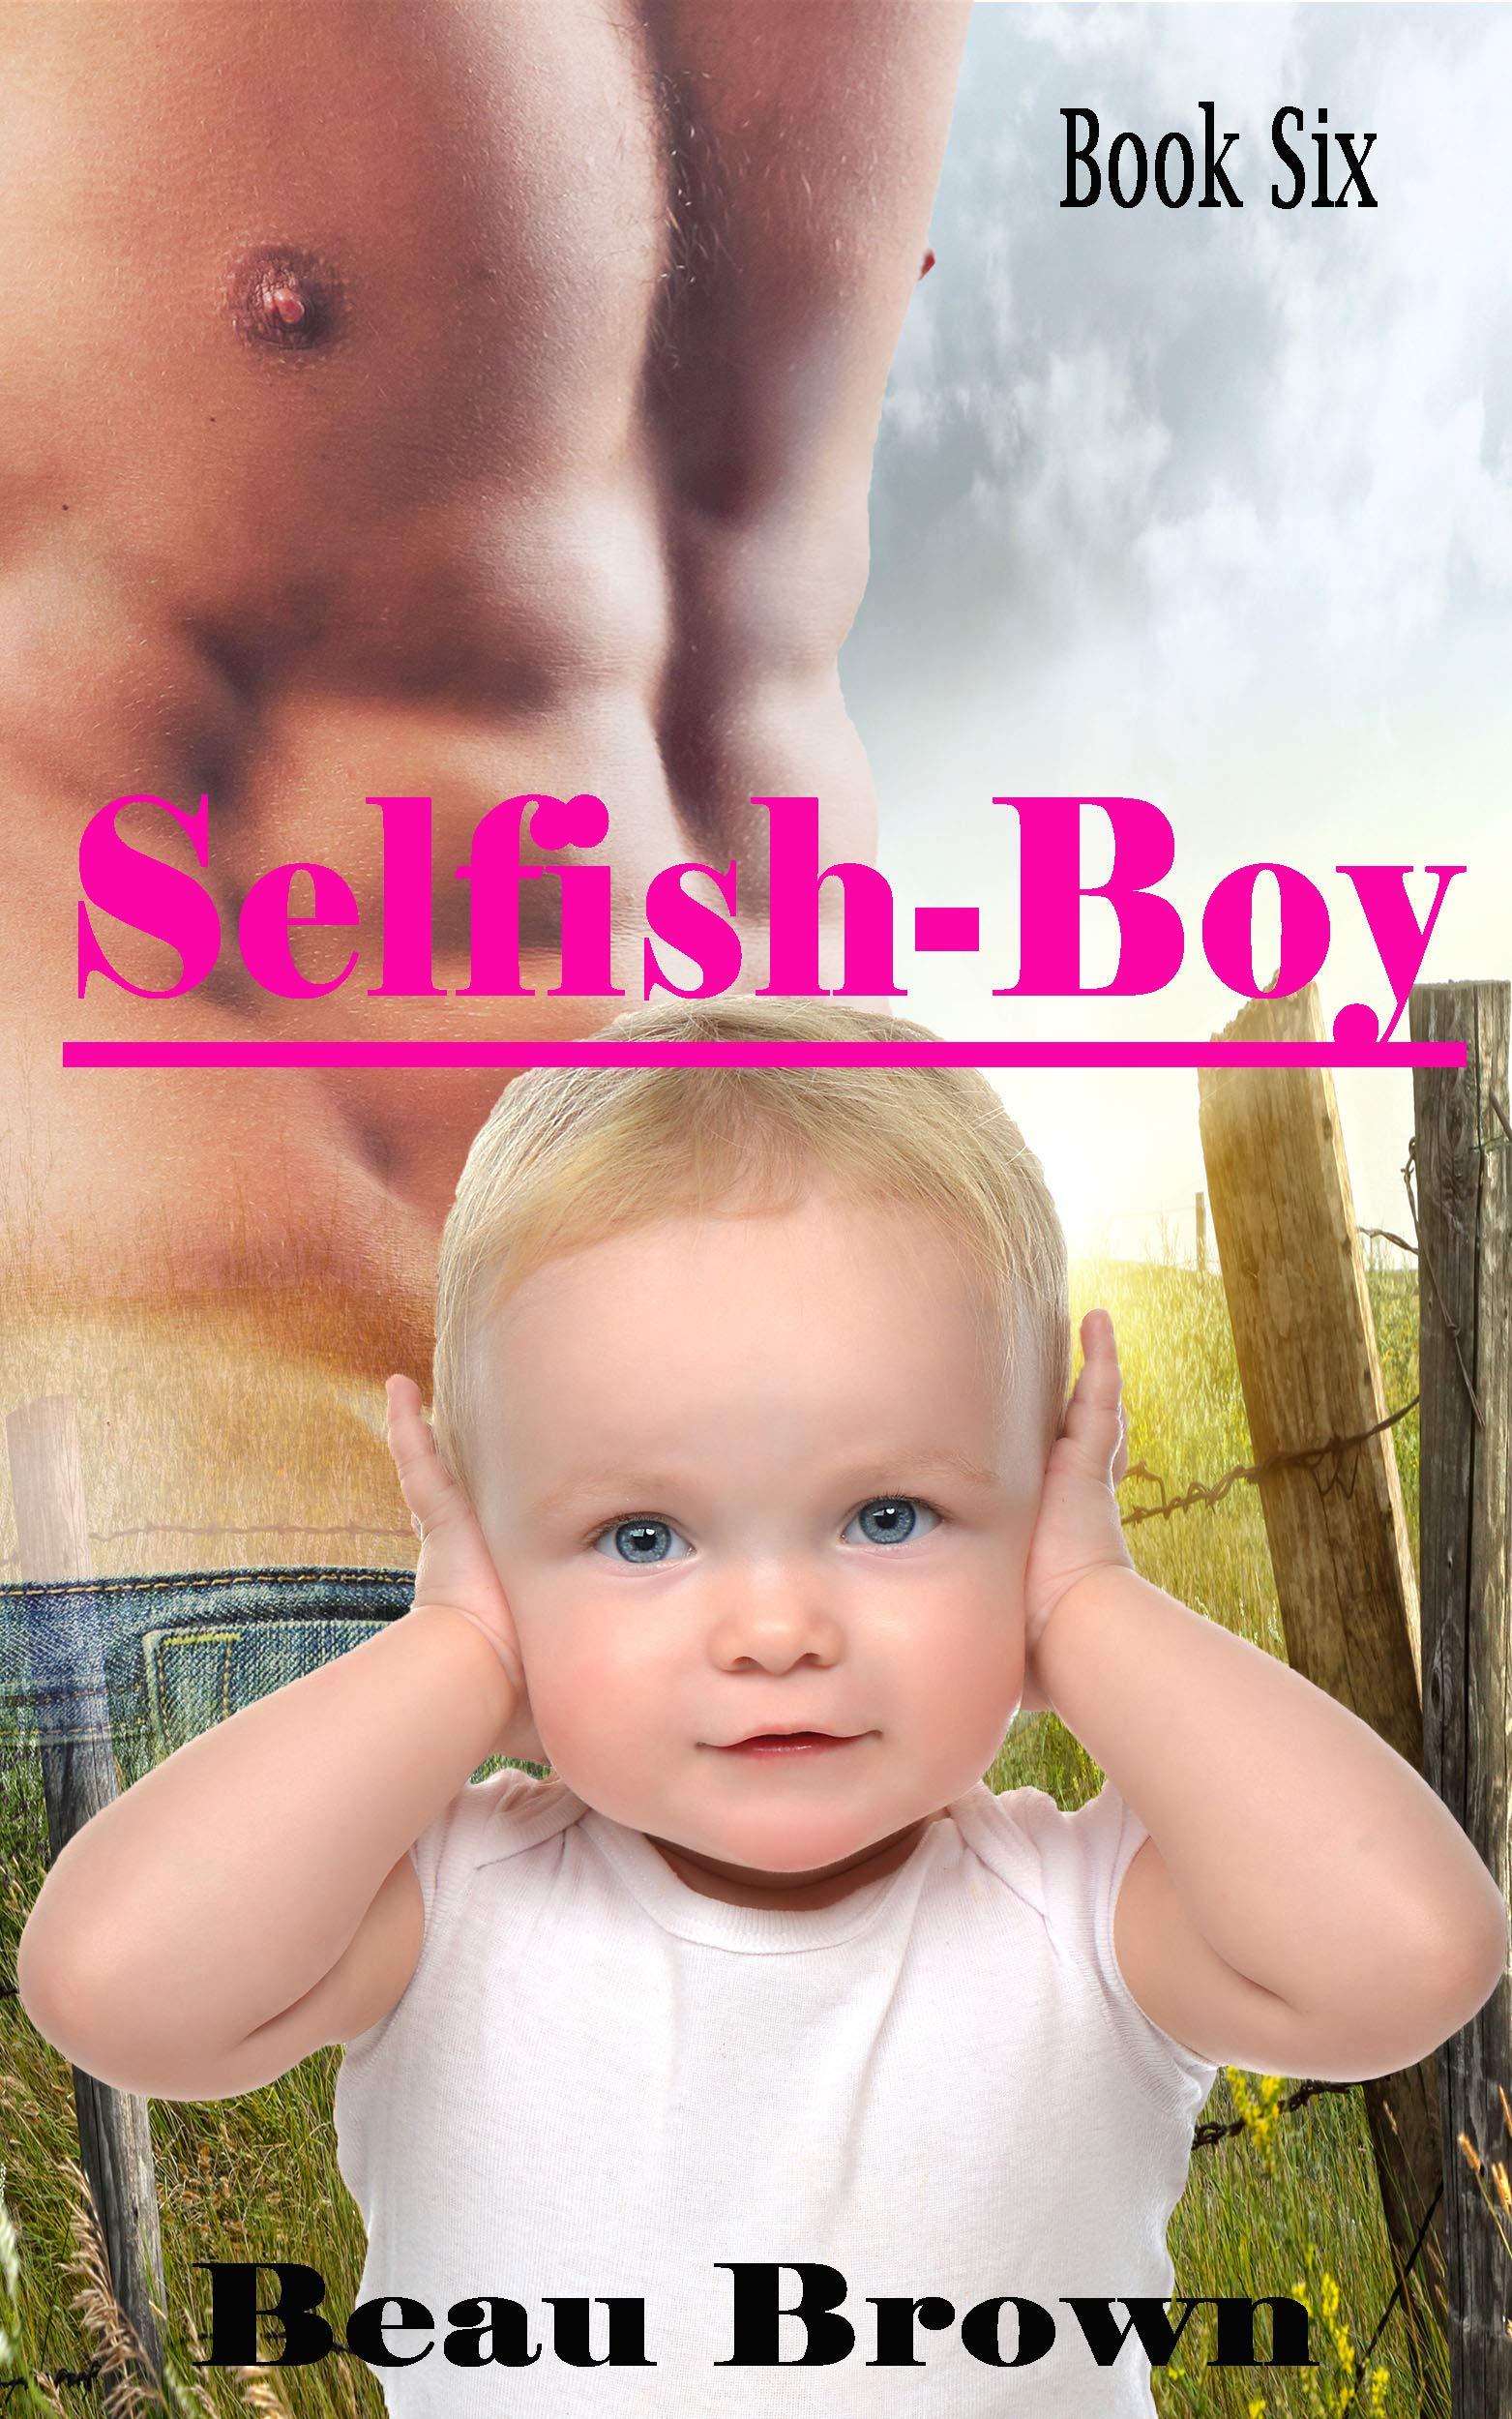 Selfish-Boy (Red Sky, Texas #6)